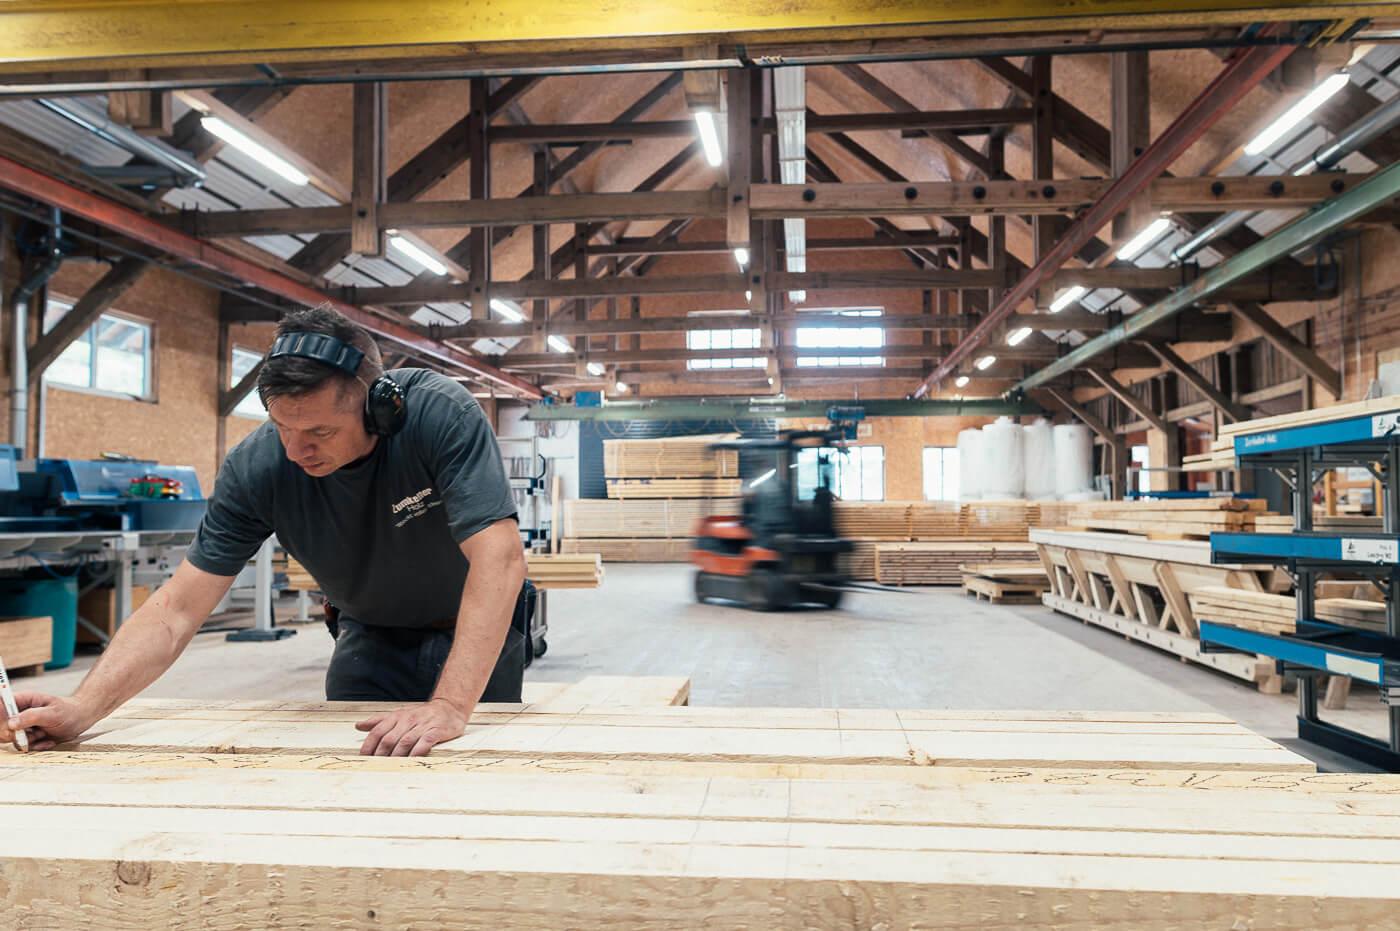 Zumkeller Holzbaubetrieb Todtmoos haus